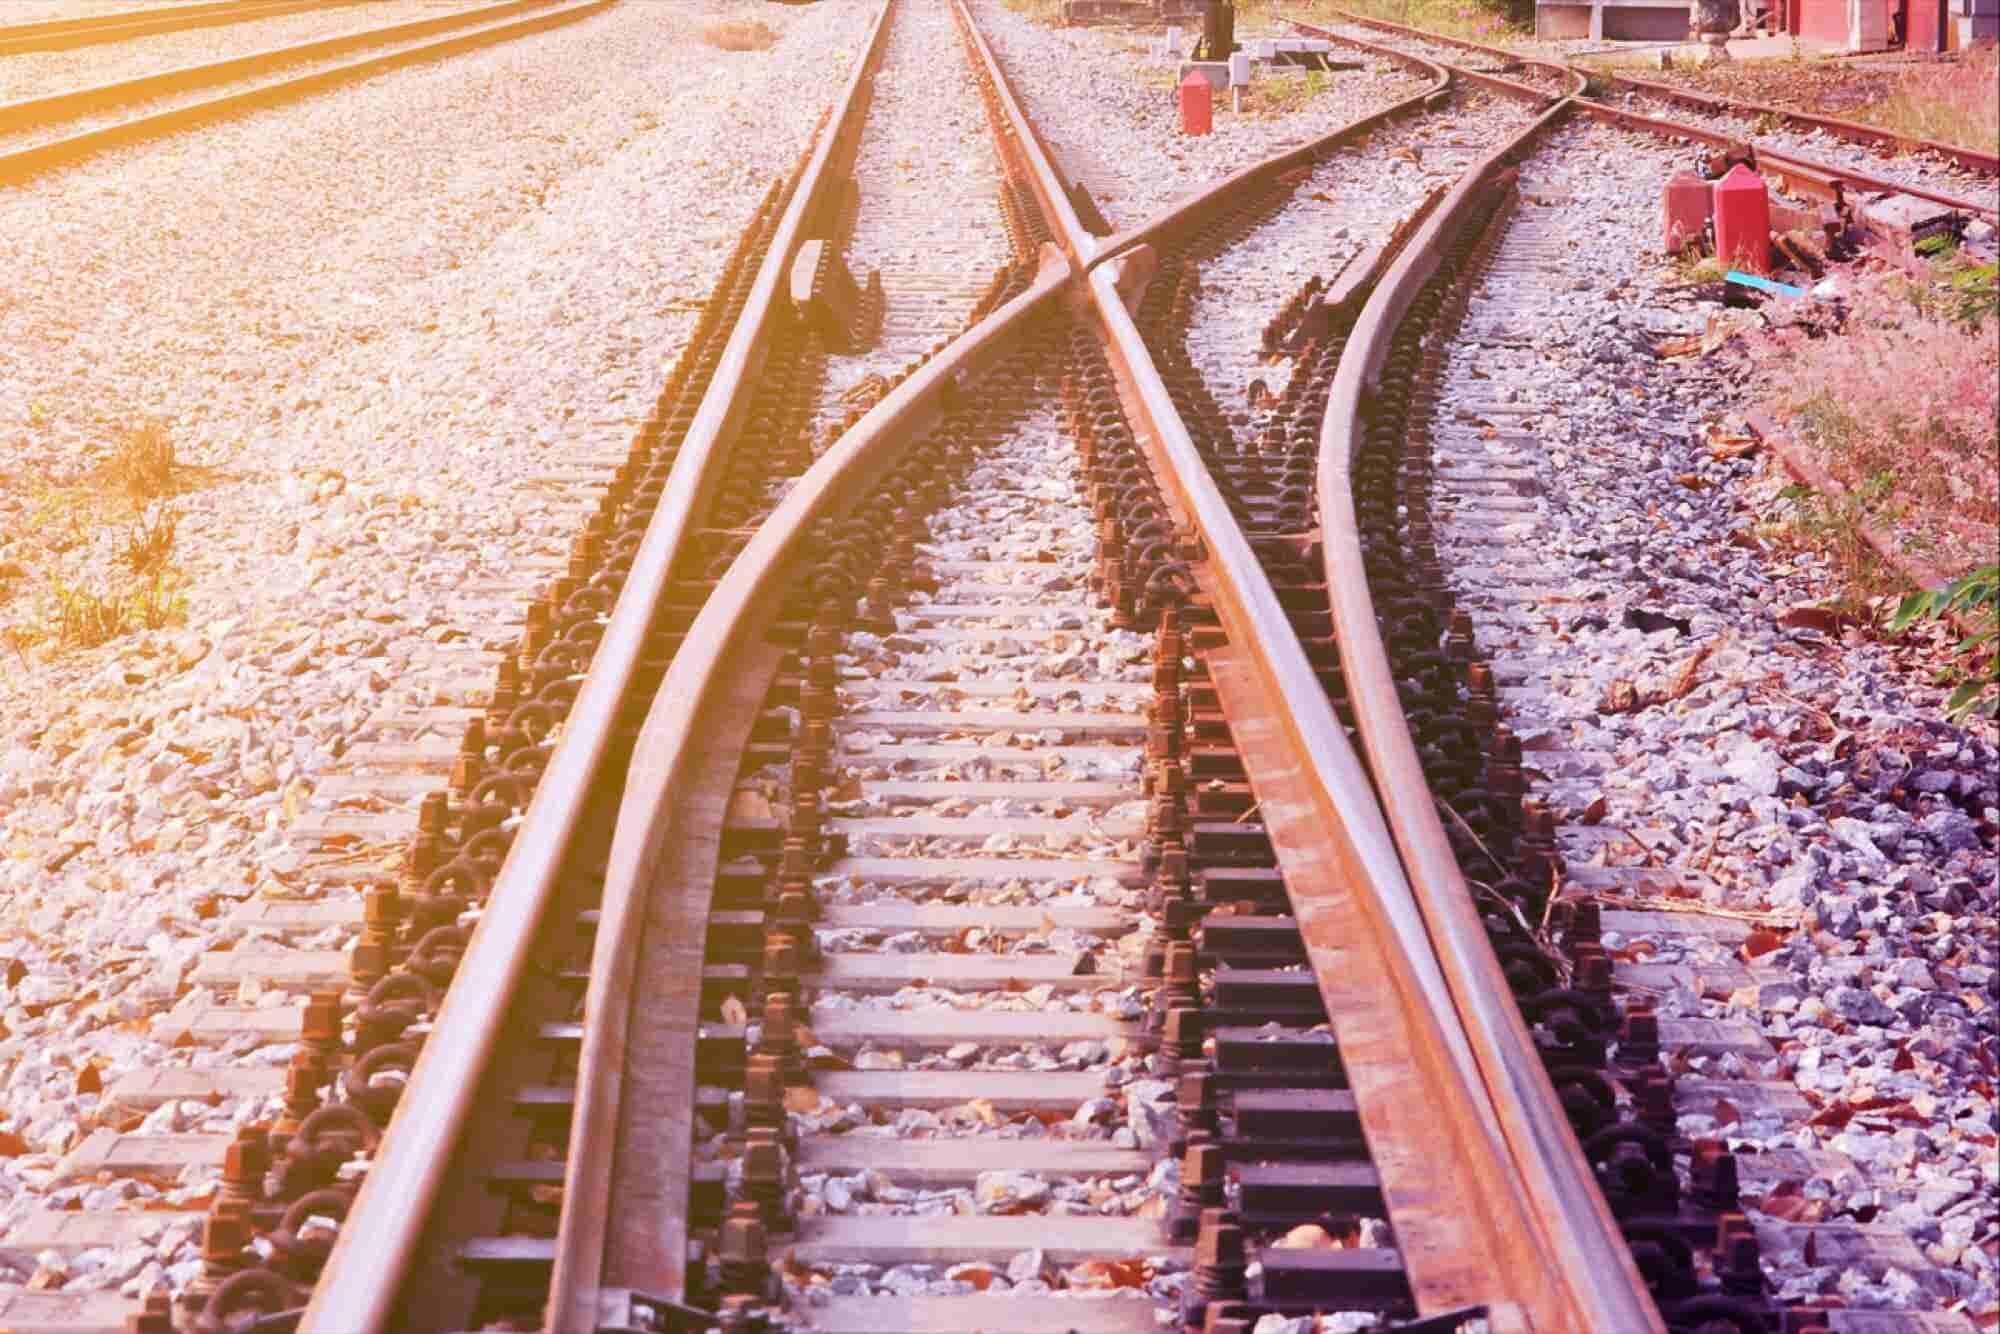 8 Ways To Pivot Your Business To Kickstart Growth